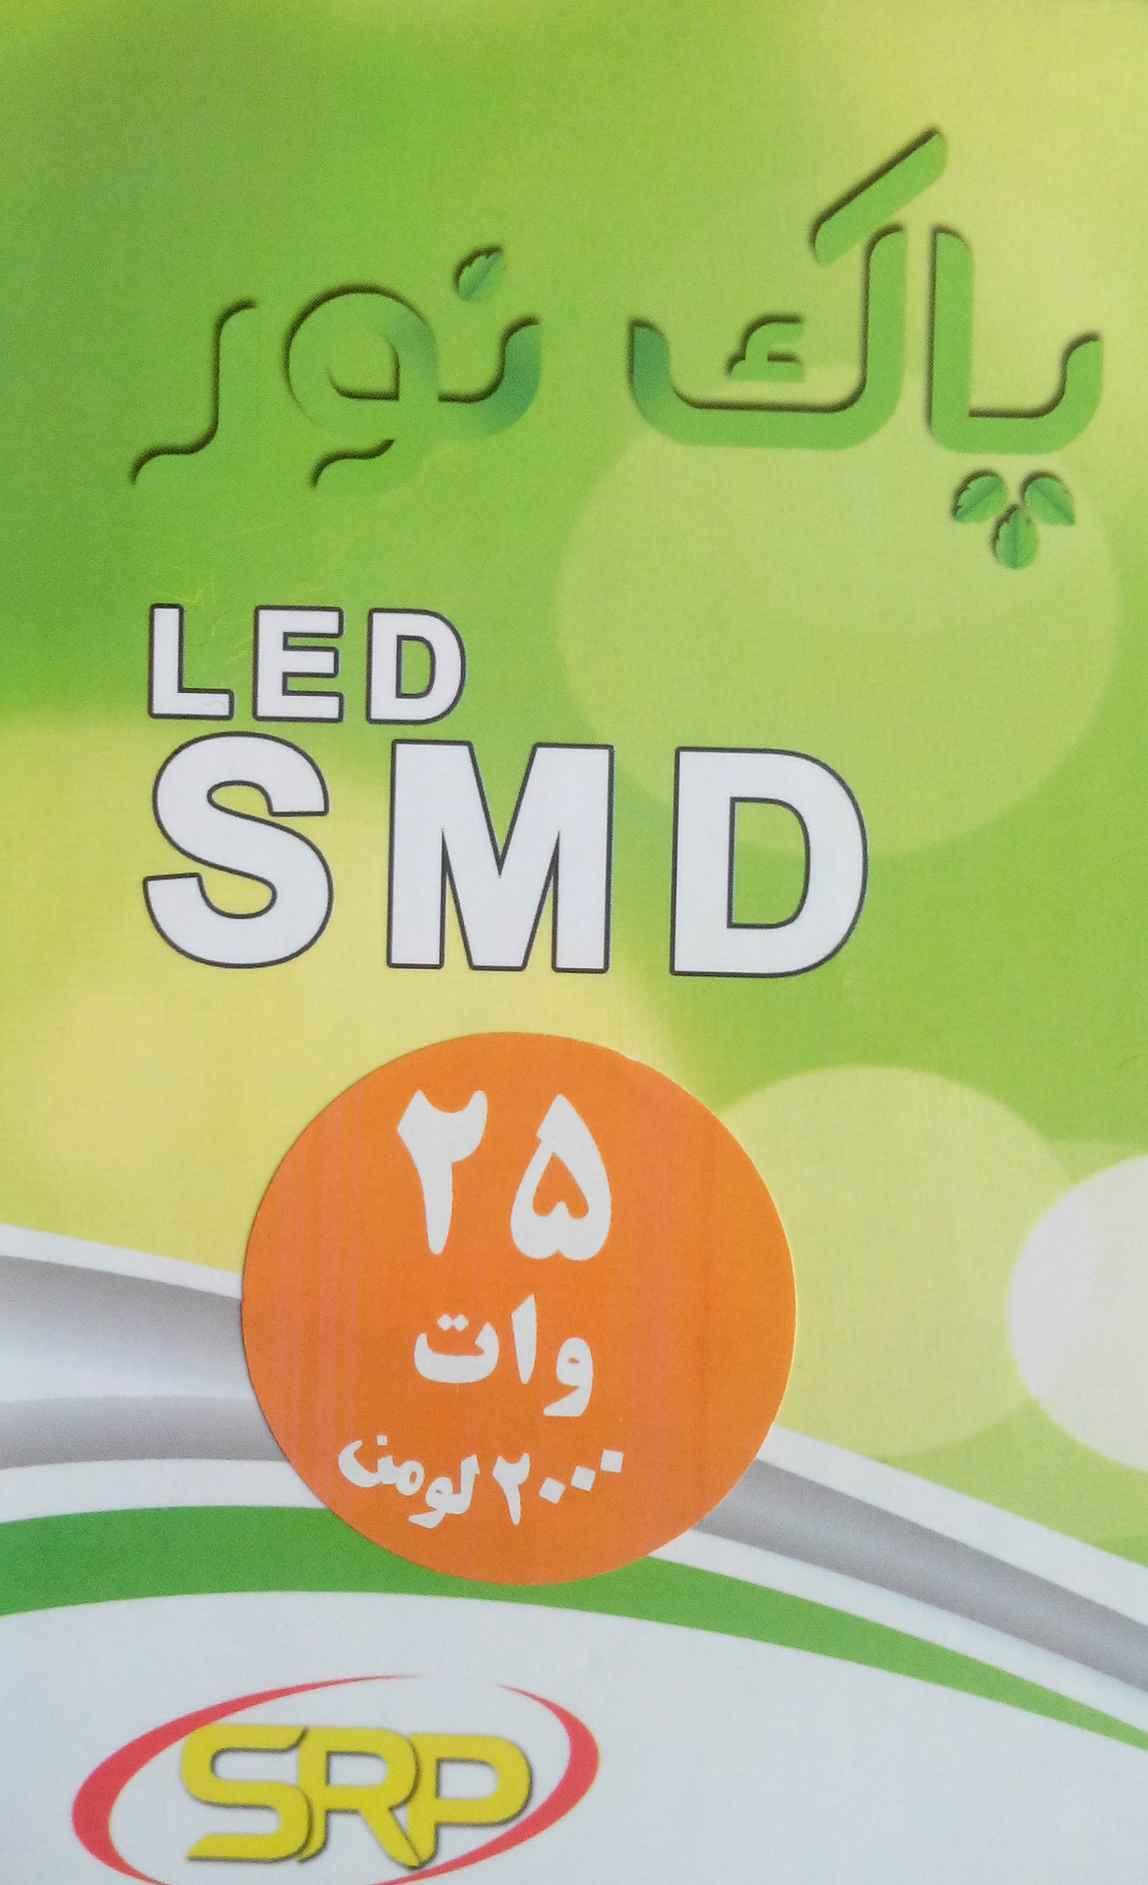 لامپ اس ام دی پاک نور 25 وات